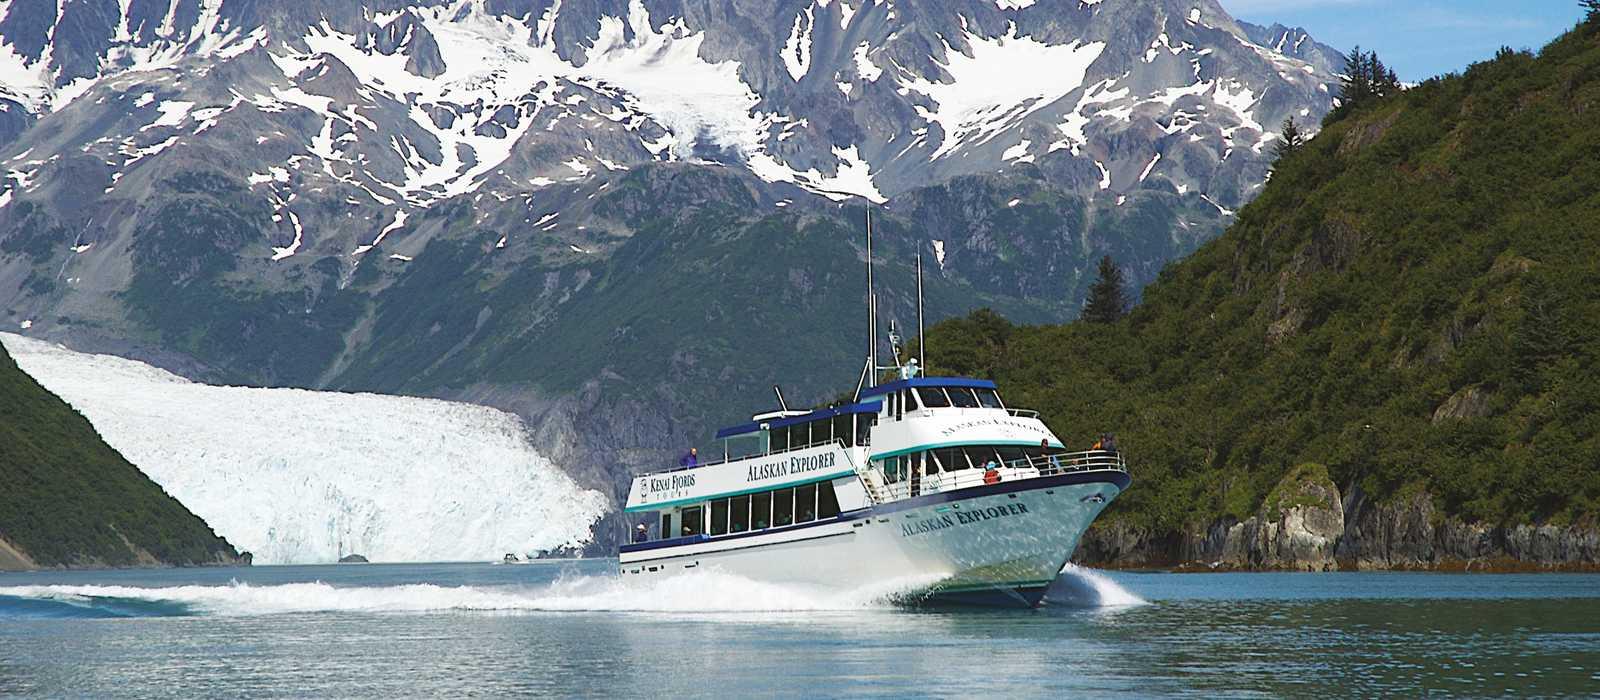 Kenai Fjords Tours Glaciers